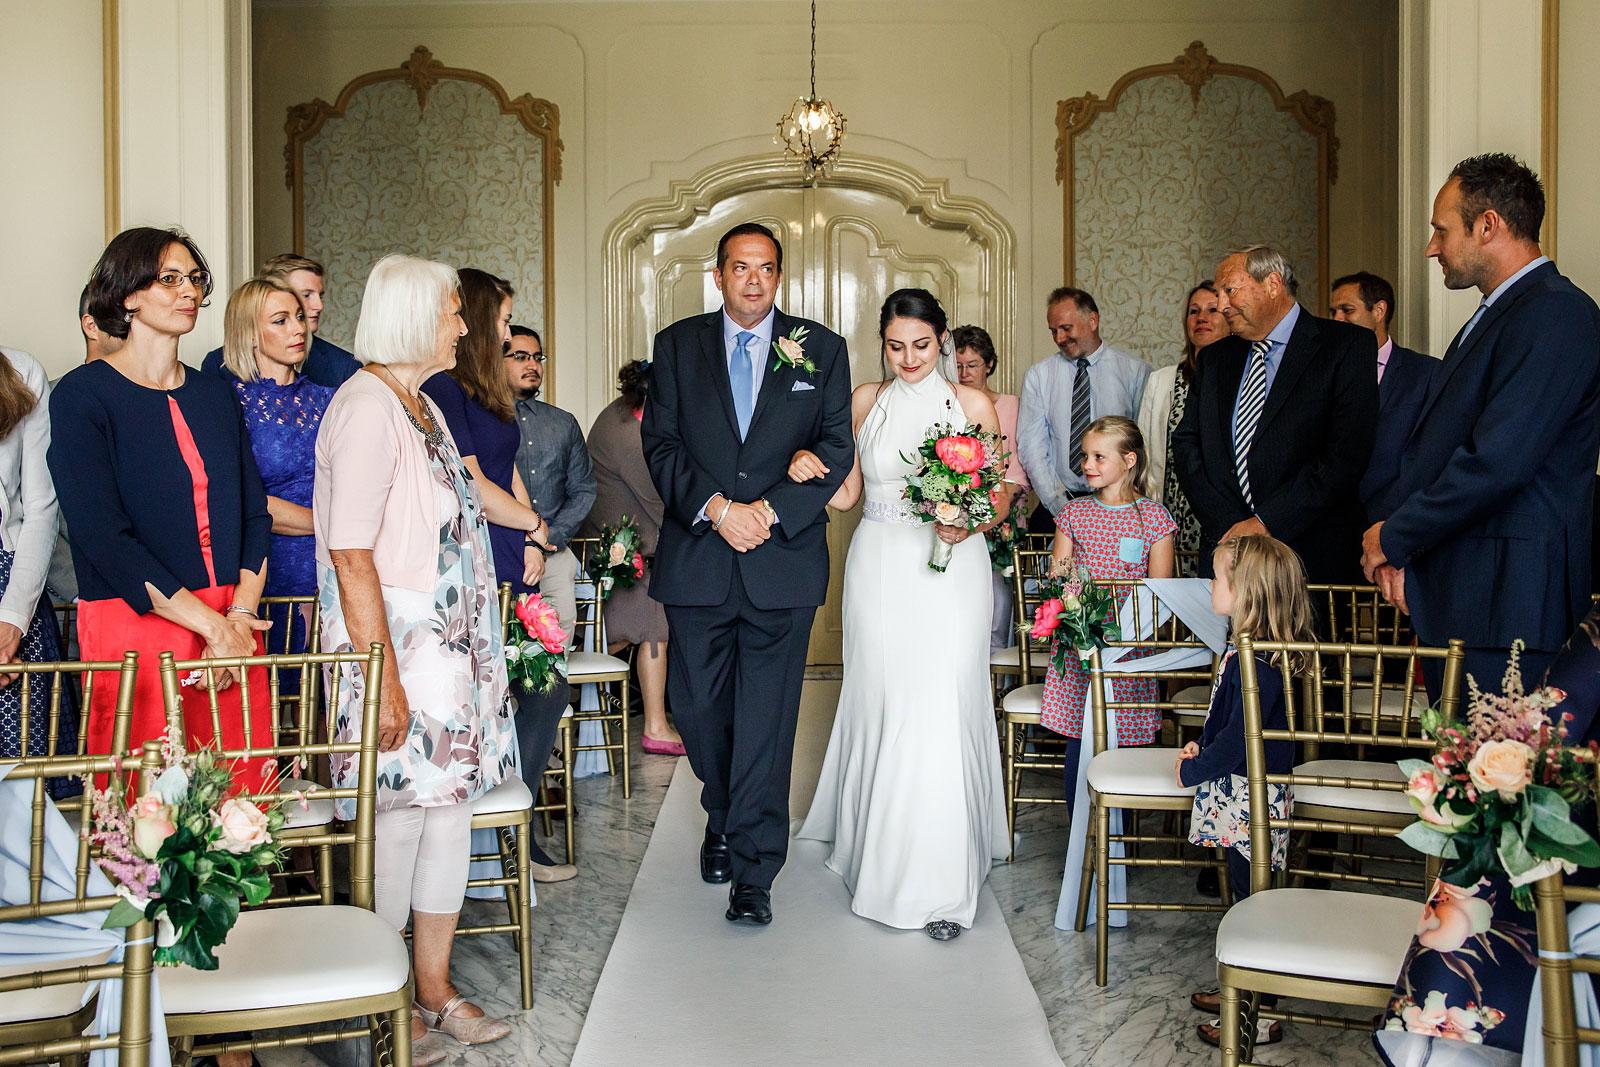 ceremonie entree bruid